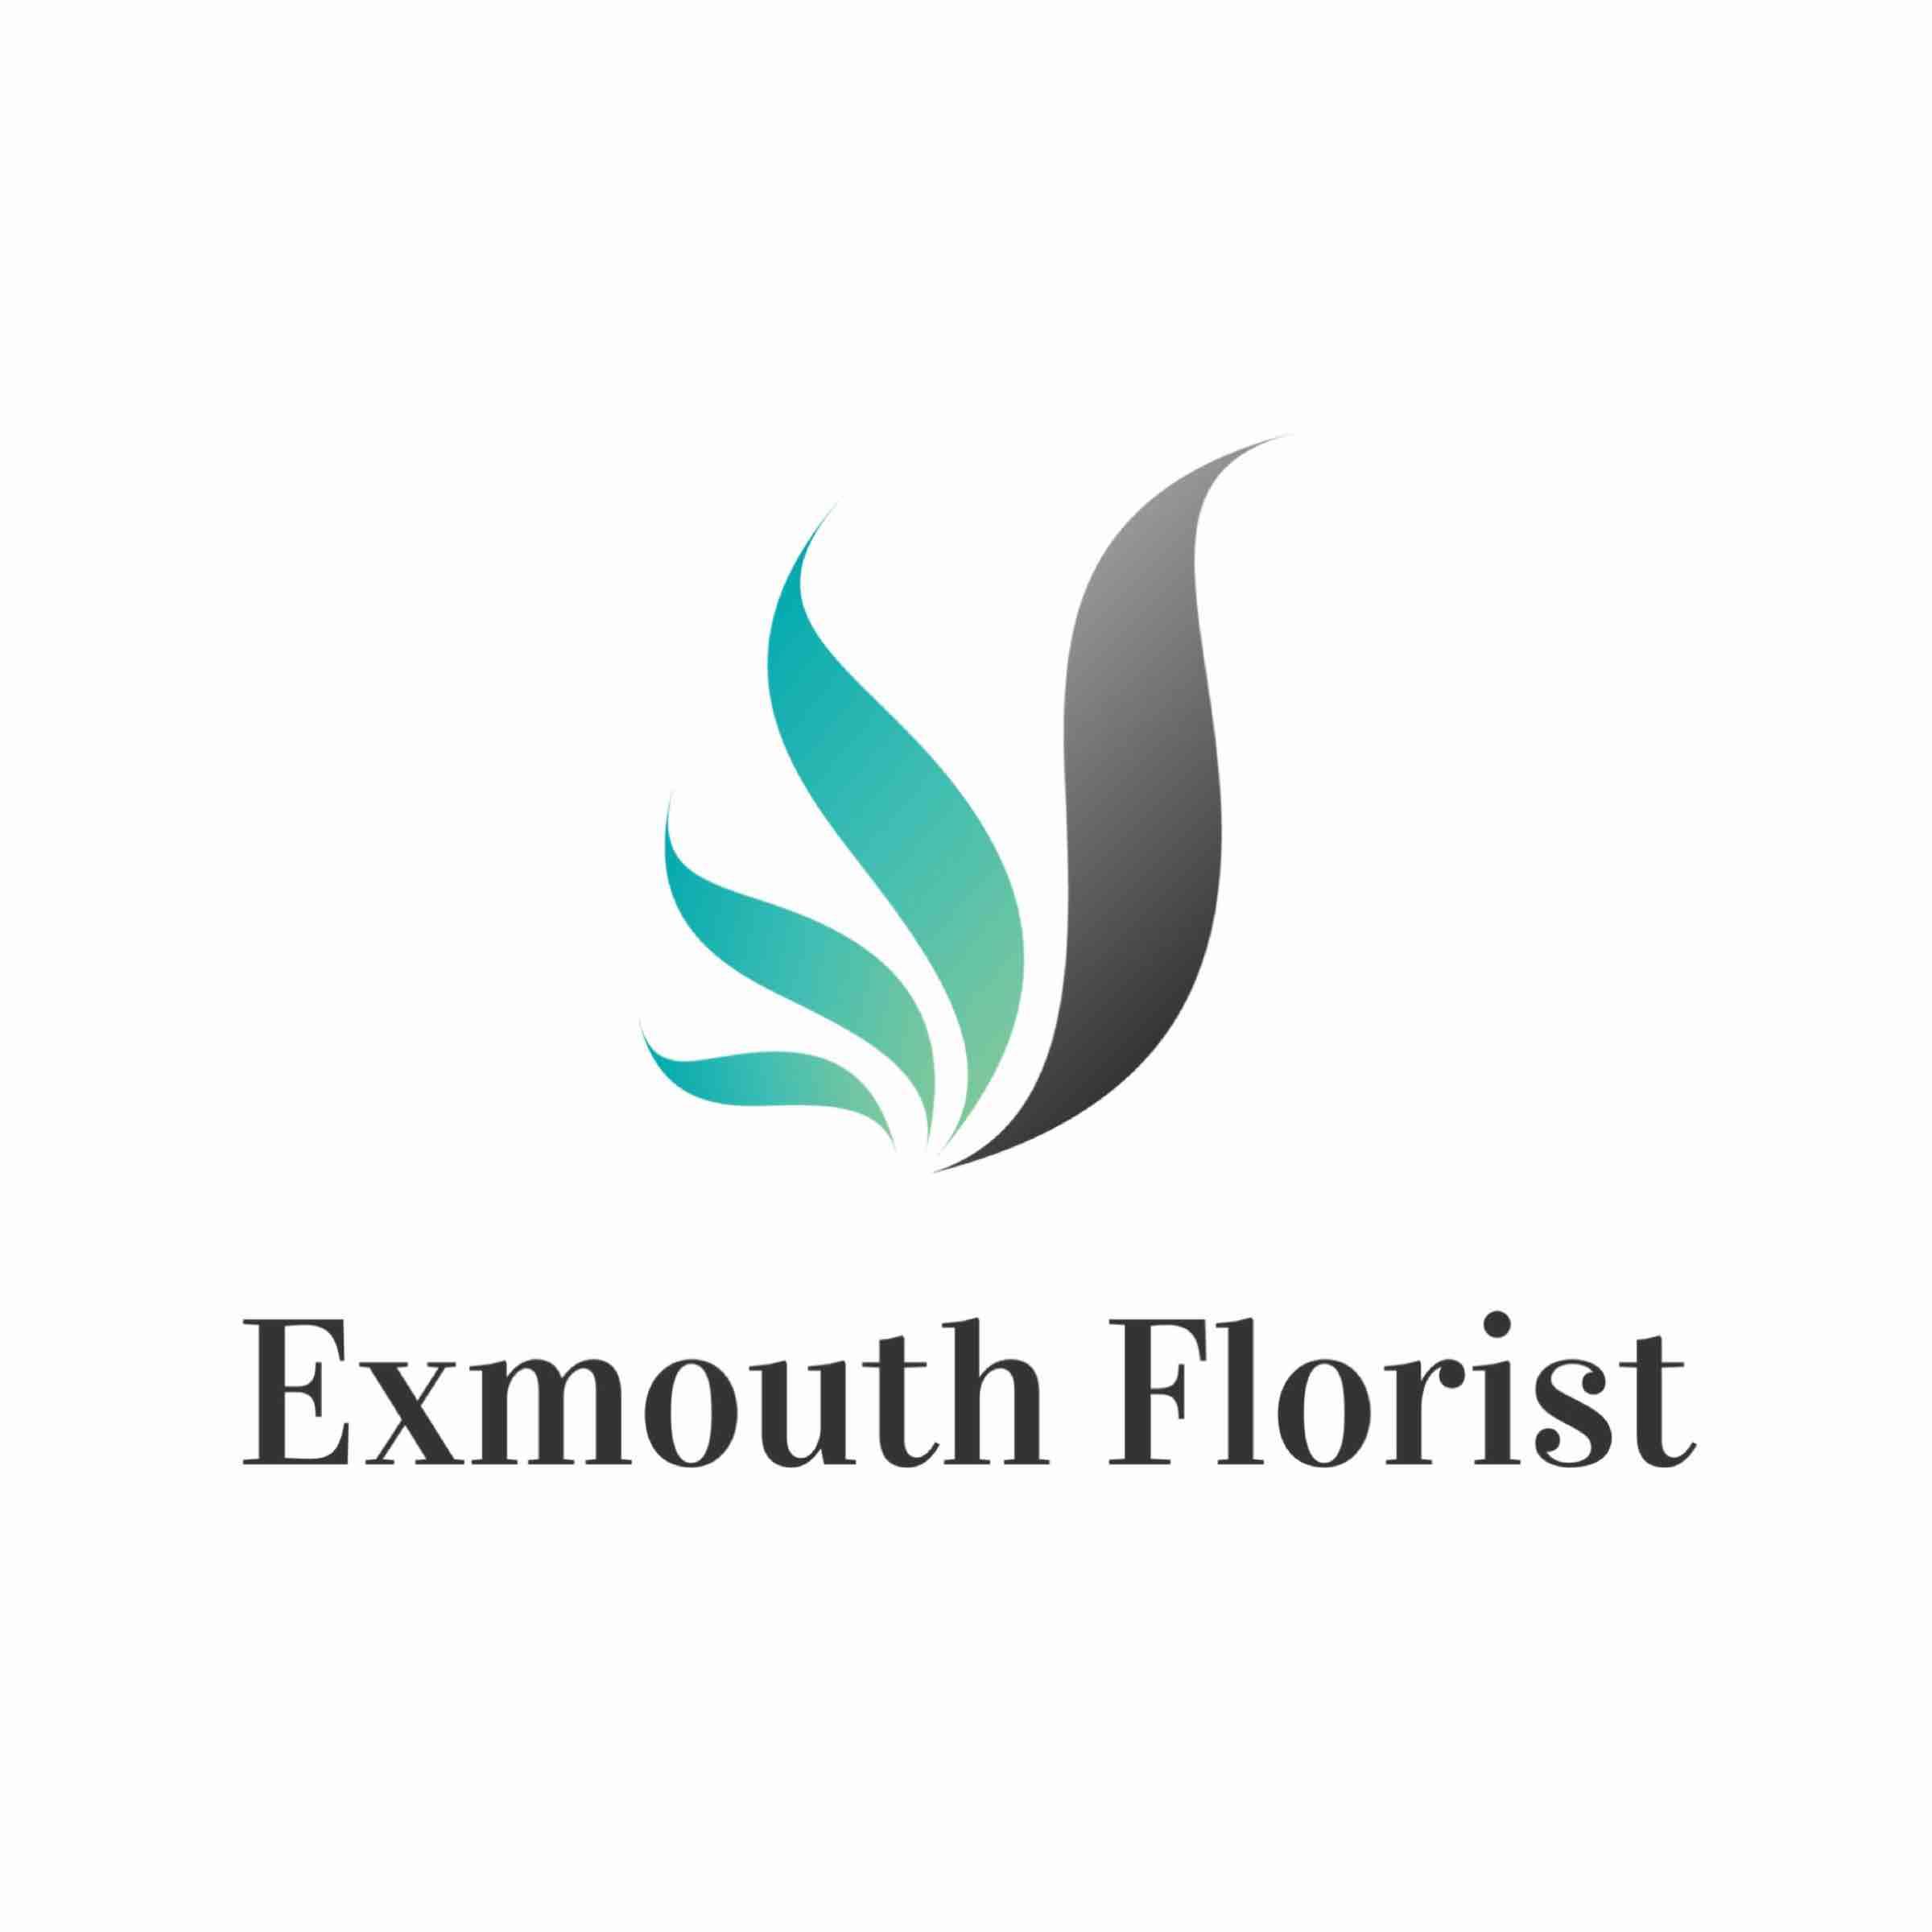 Exmouth Florist - logo